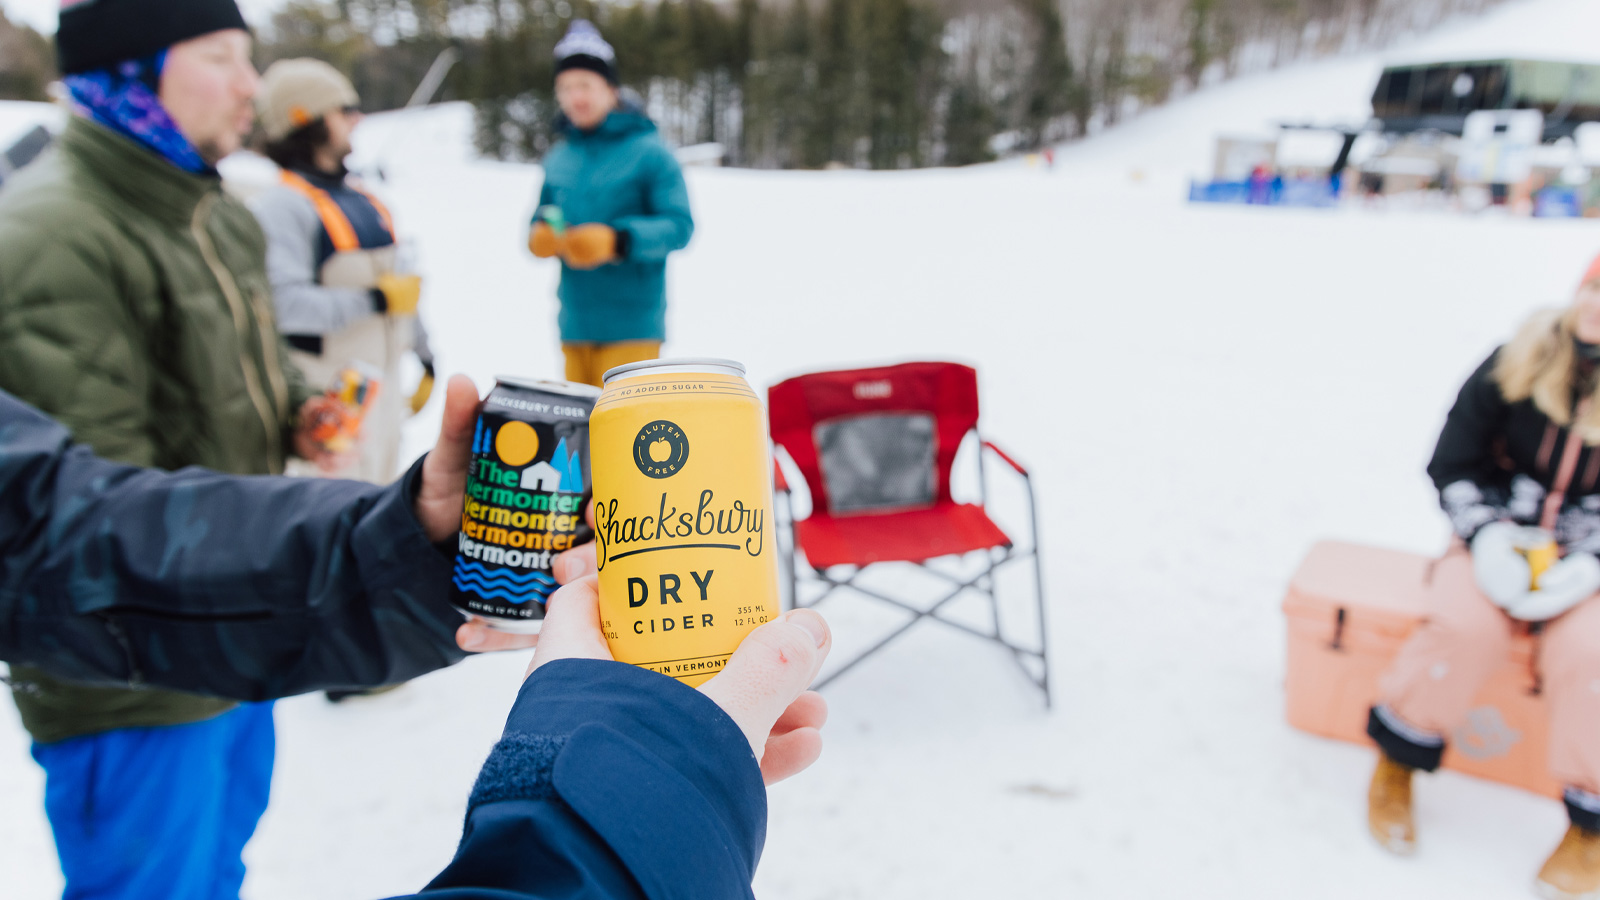 shacksbury cider, mount sunapee, skiing, the ski monster